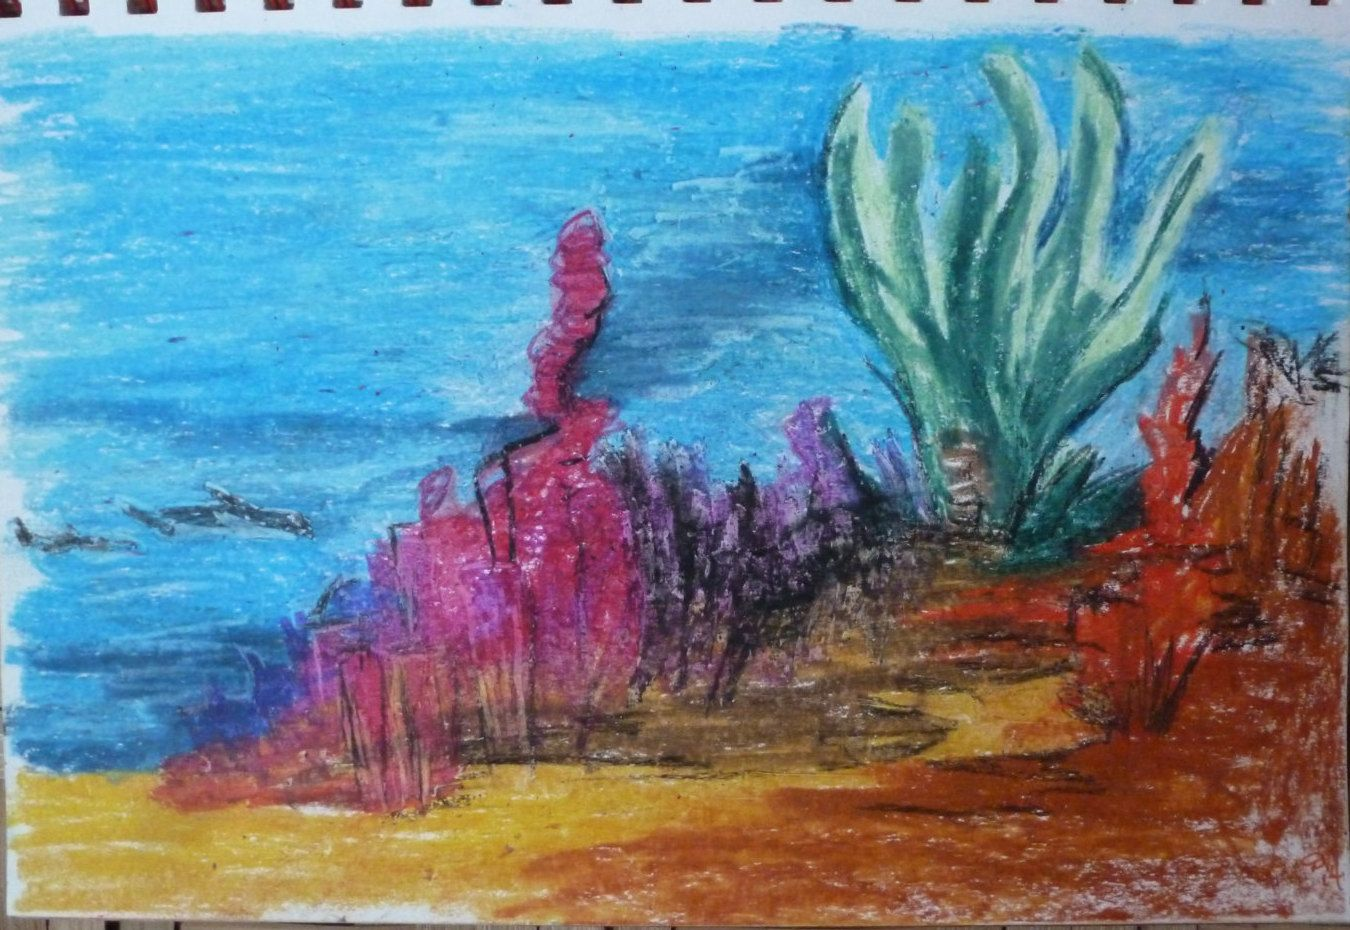 Distant Orca By Darla Vaughan Oil Pastel Painting Ocean Creatures Fine Art Drawing Seascape Unmatted Unframed Underwat Oil Pastel Paintings Painting Oil Pastel